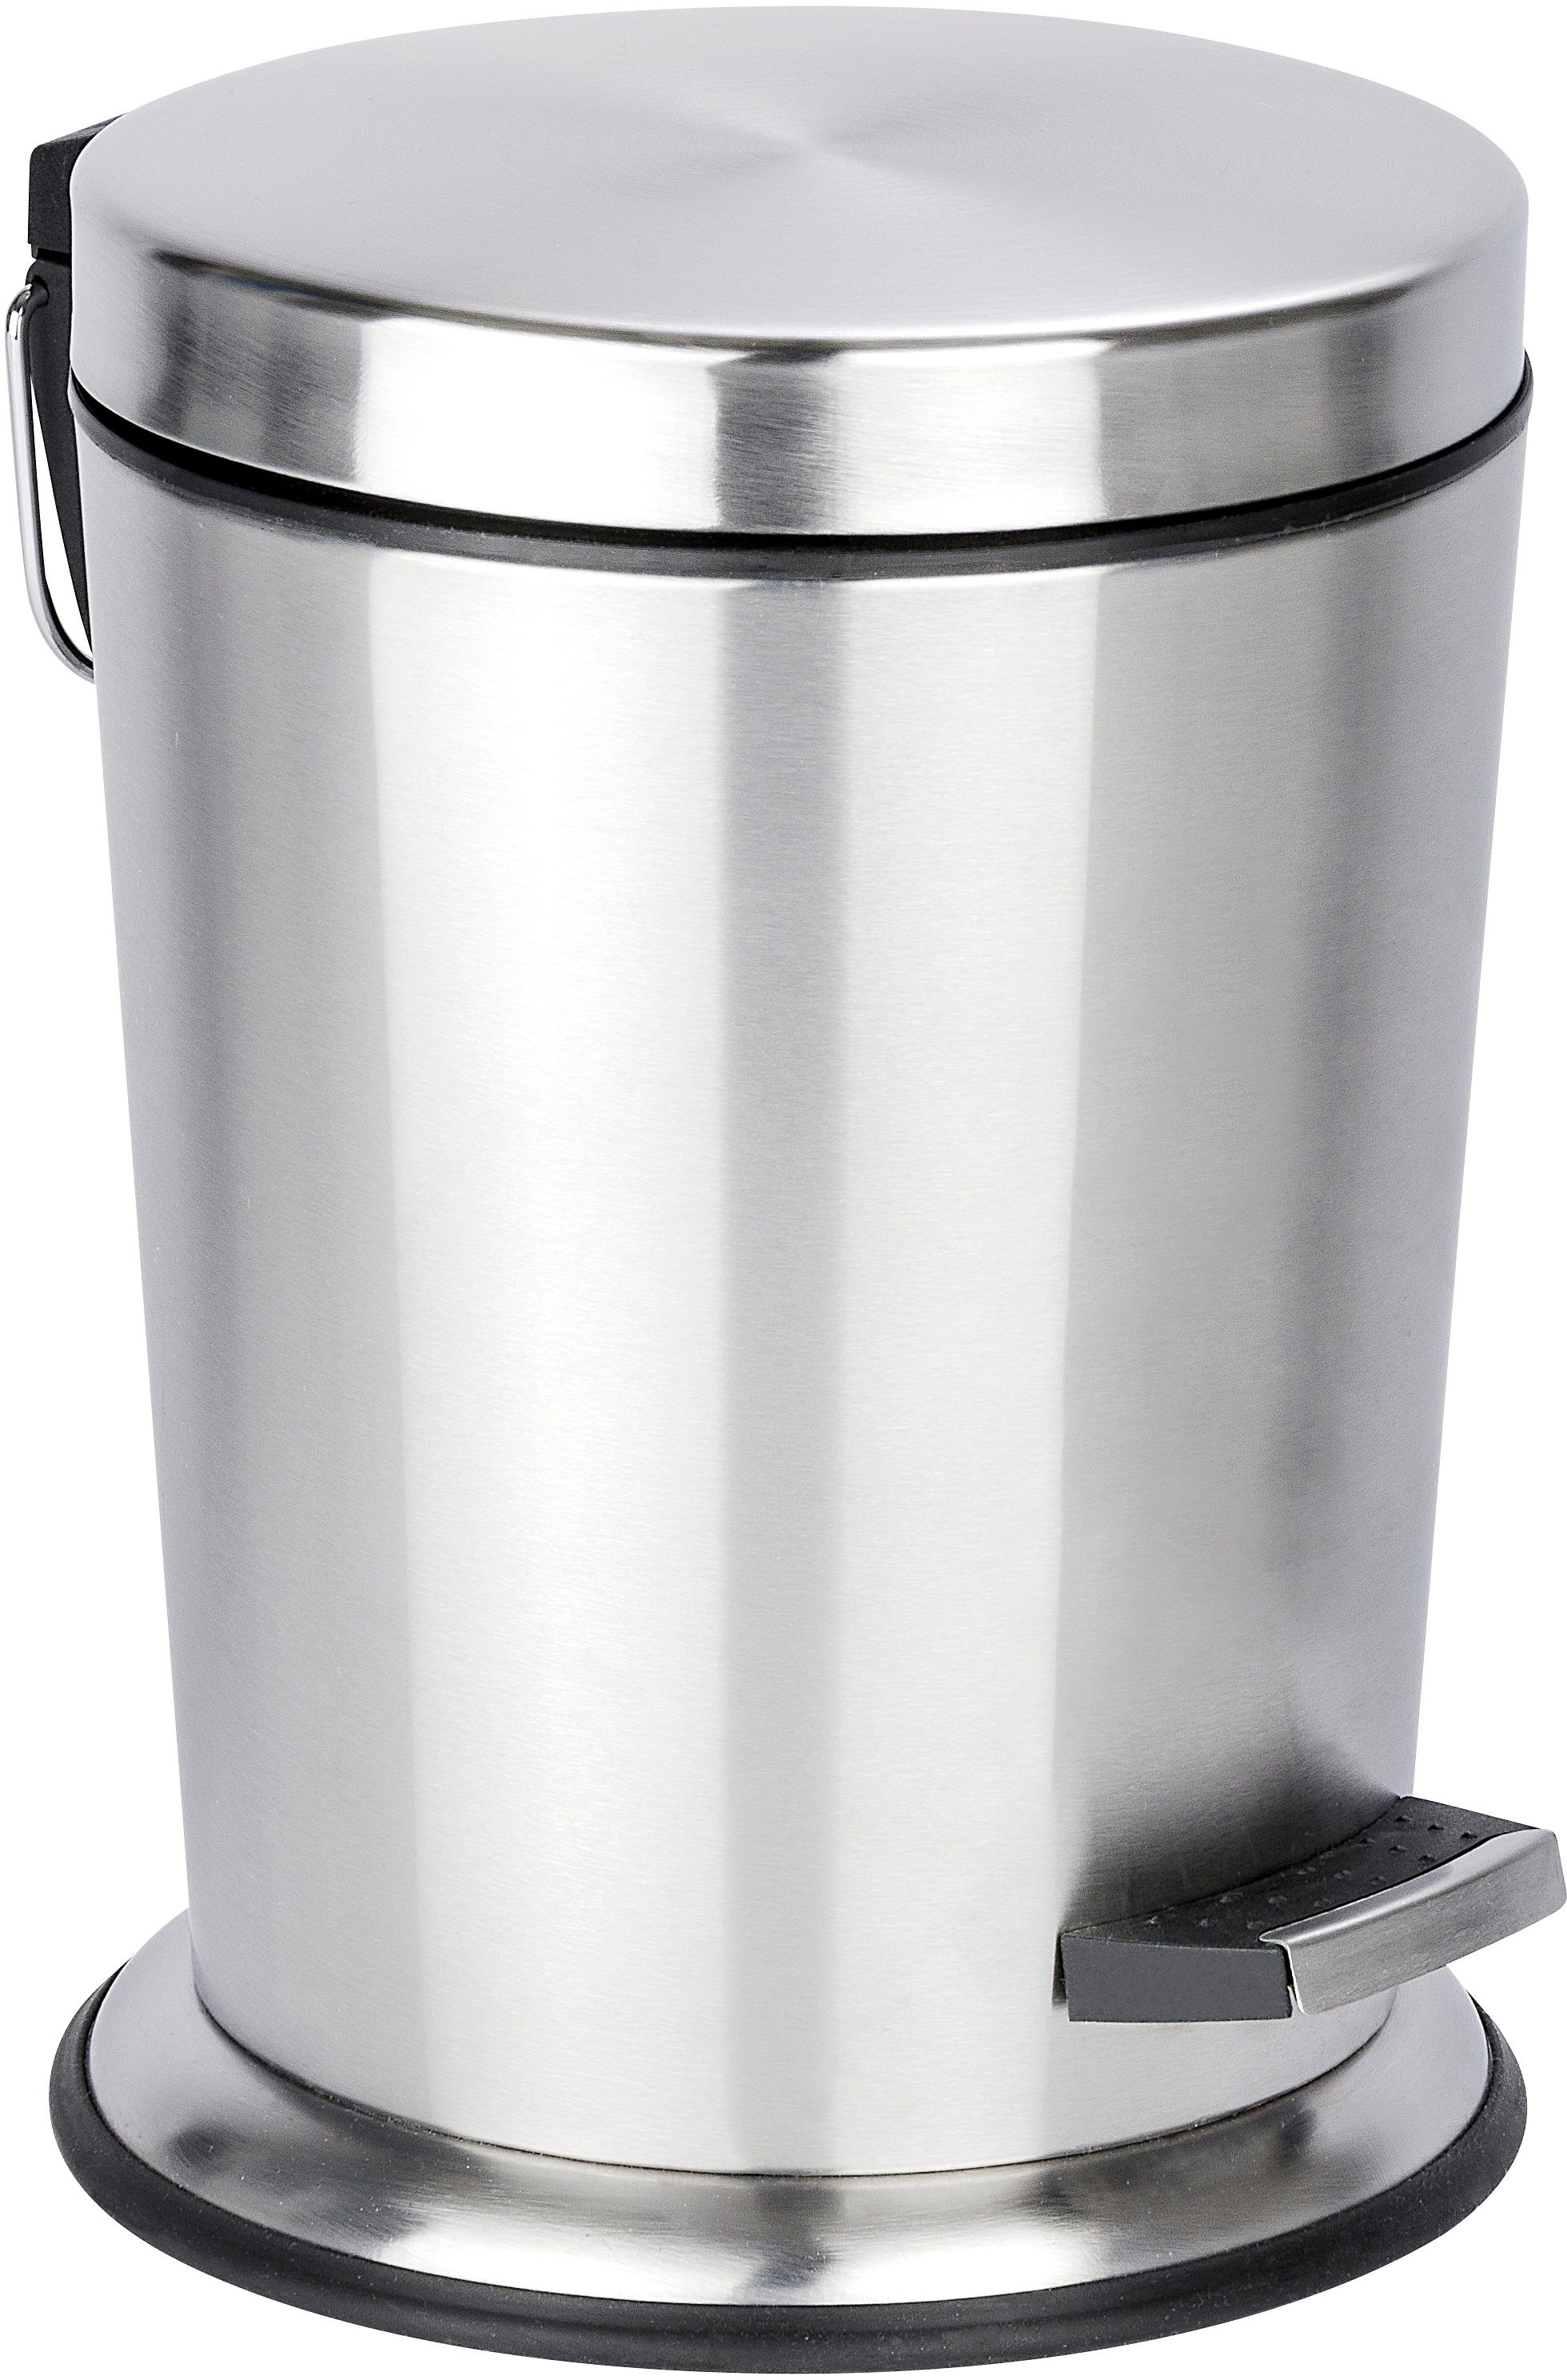 WENKO Treteimer »Easy Close«, 5 Liter, Edelstahl rostfrei, Absenkautomatik, Anti-Fingerprint